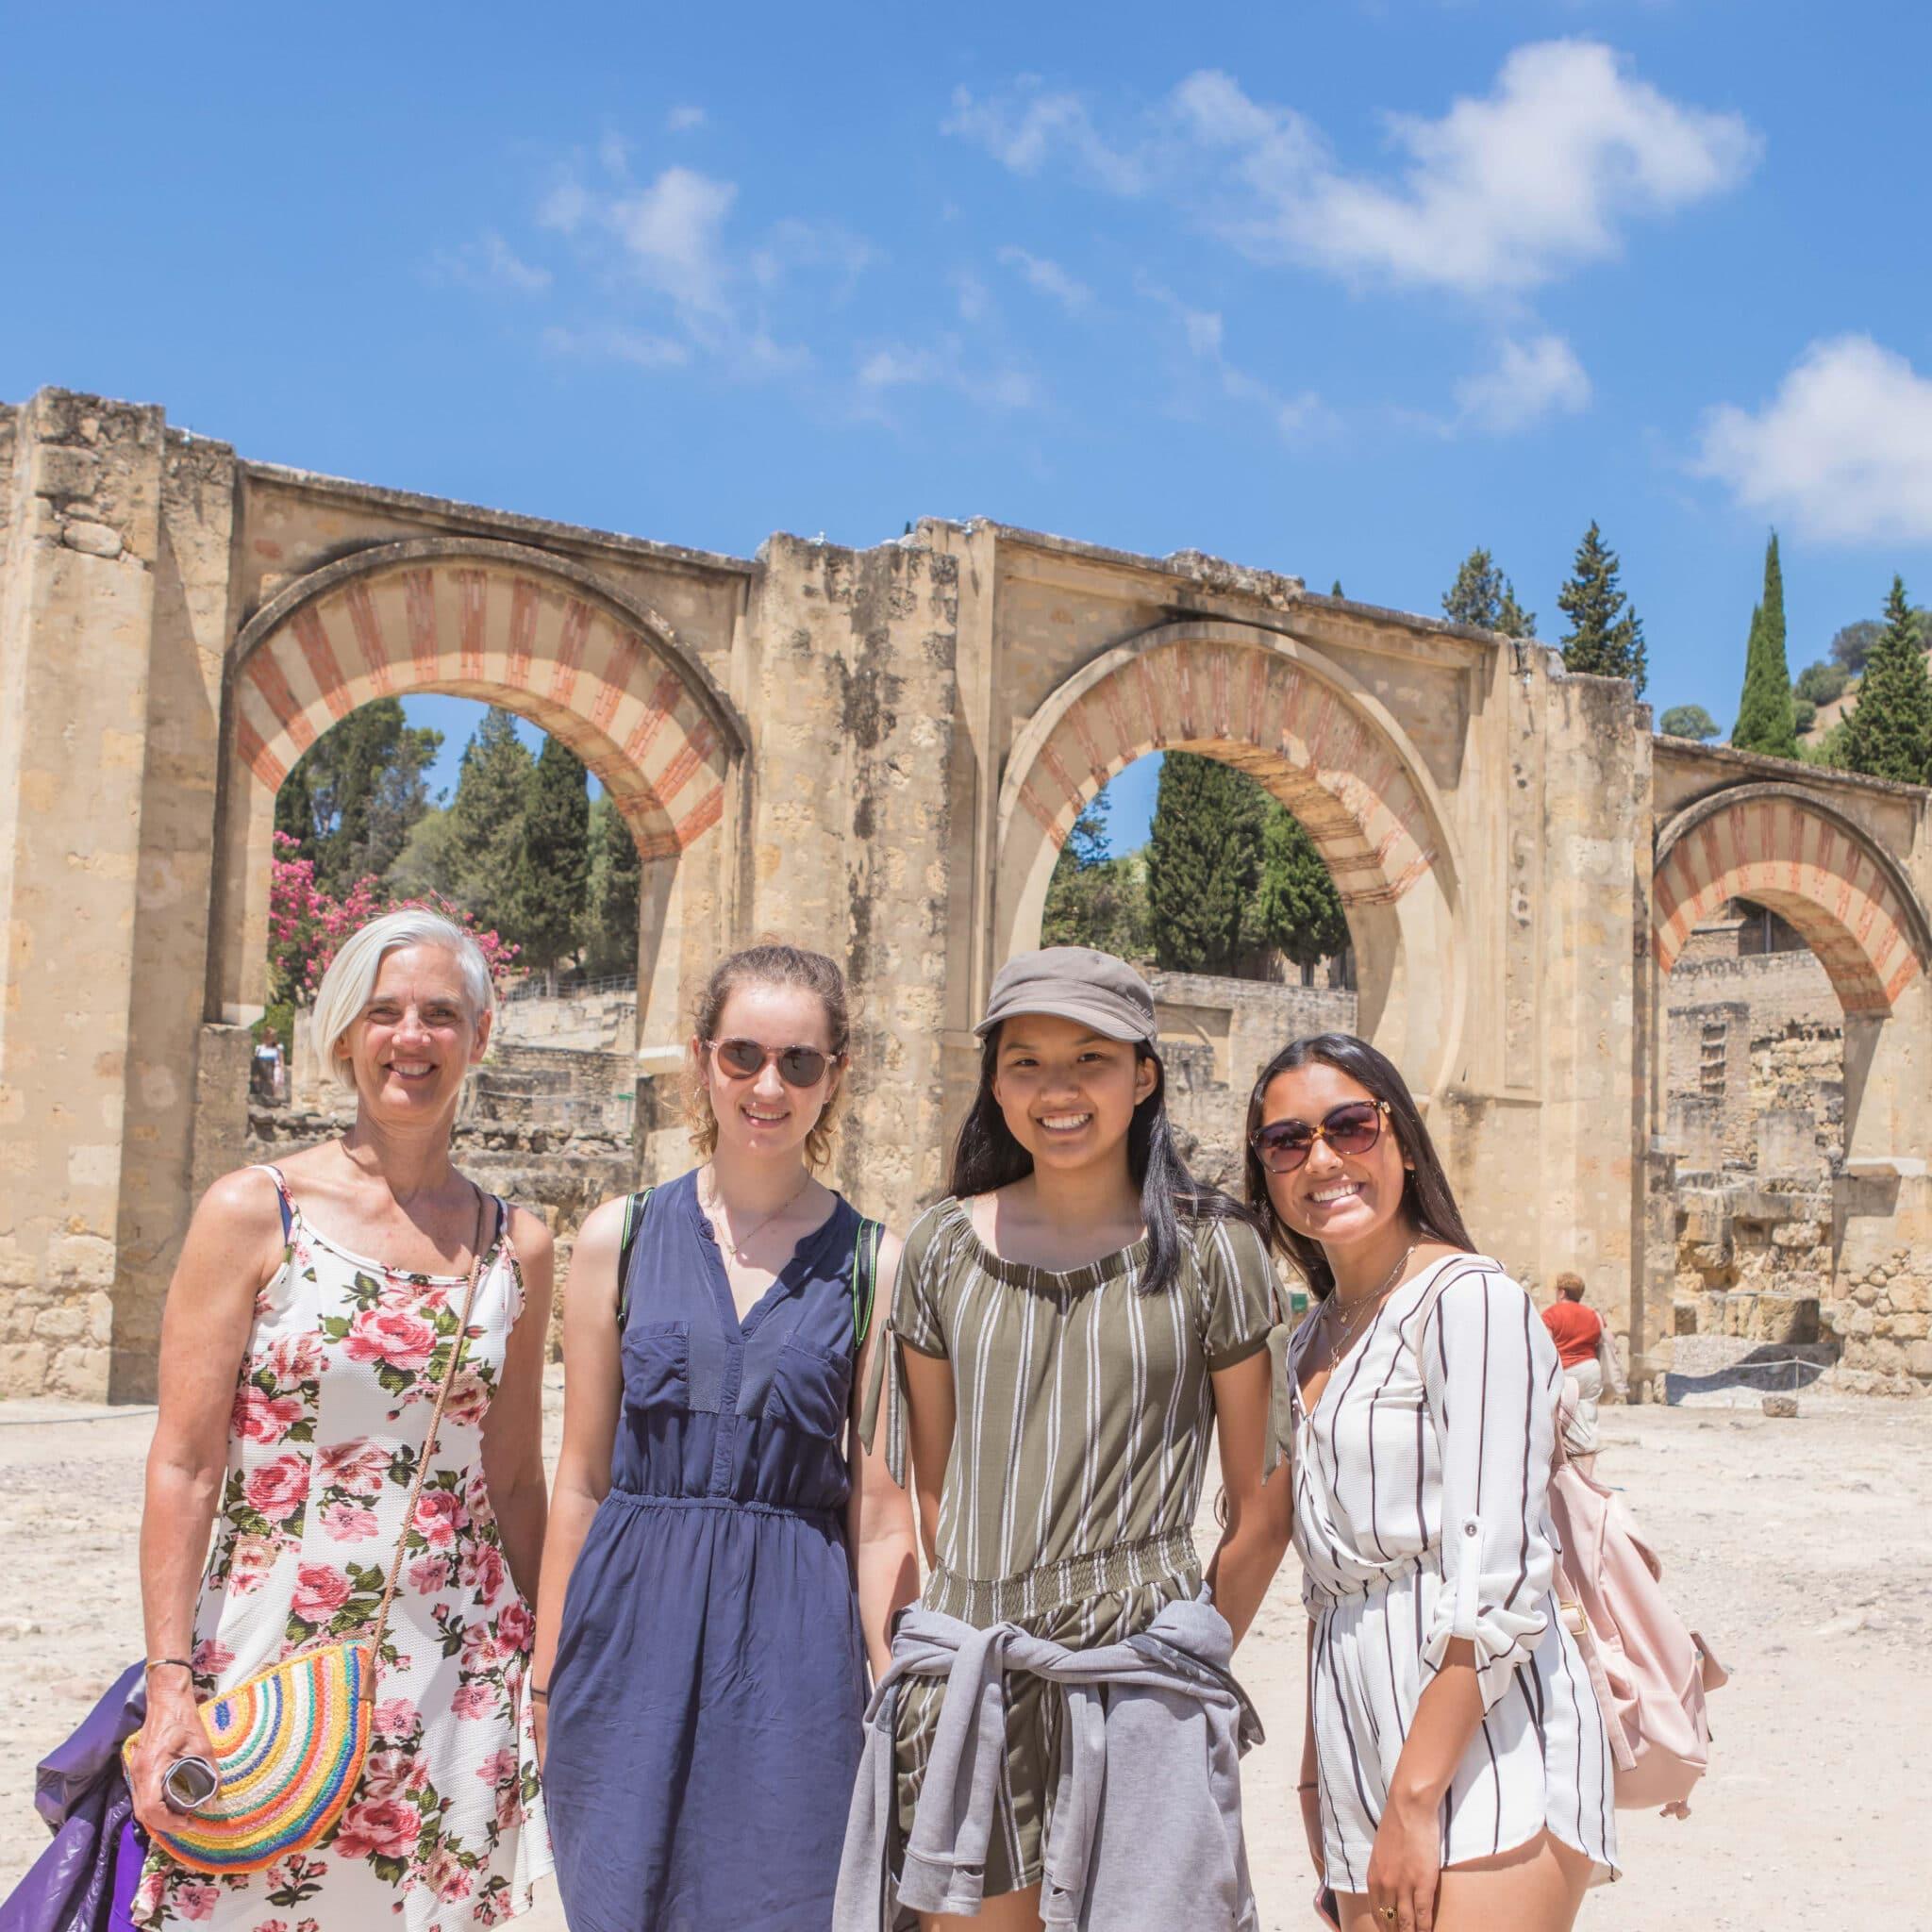 Excursion to Cordoba - pre AP Spanish language program in Spain